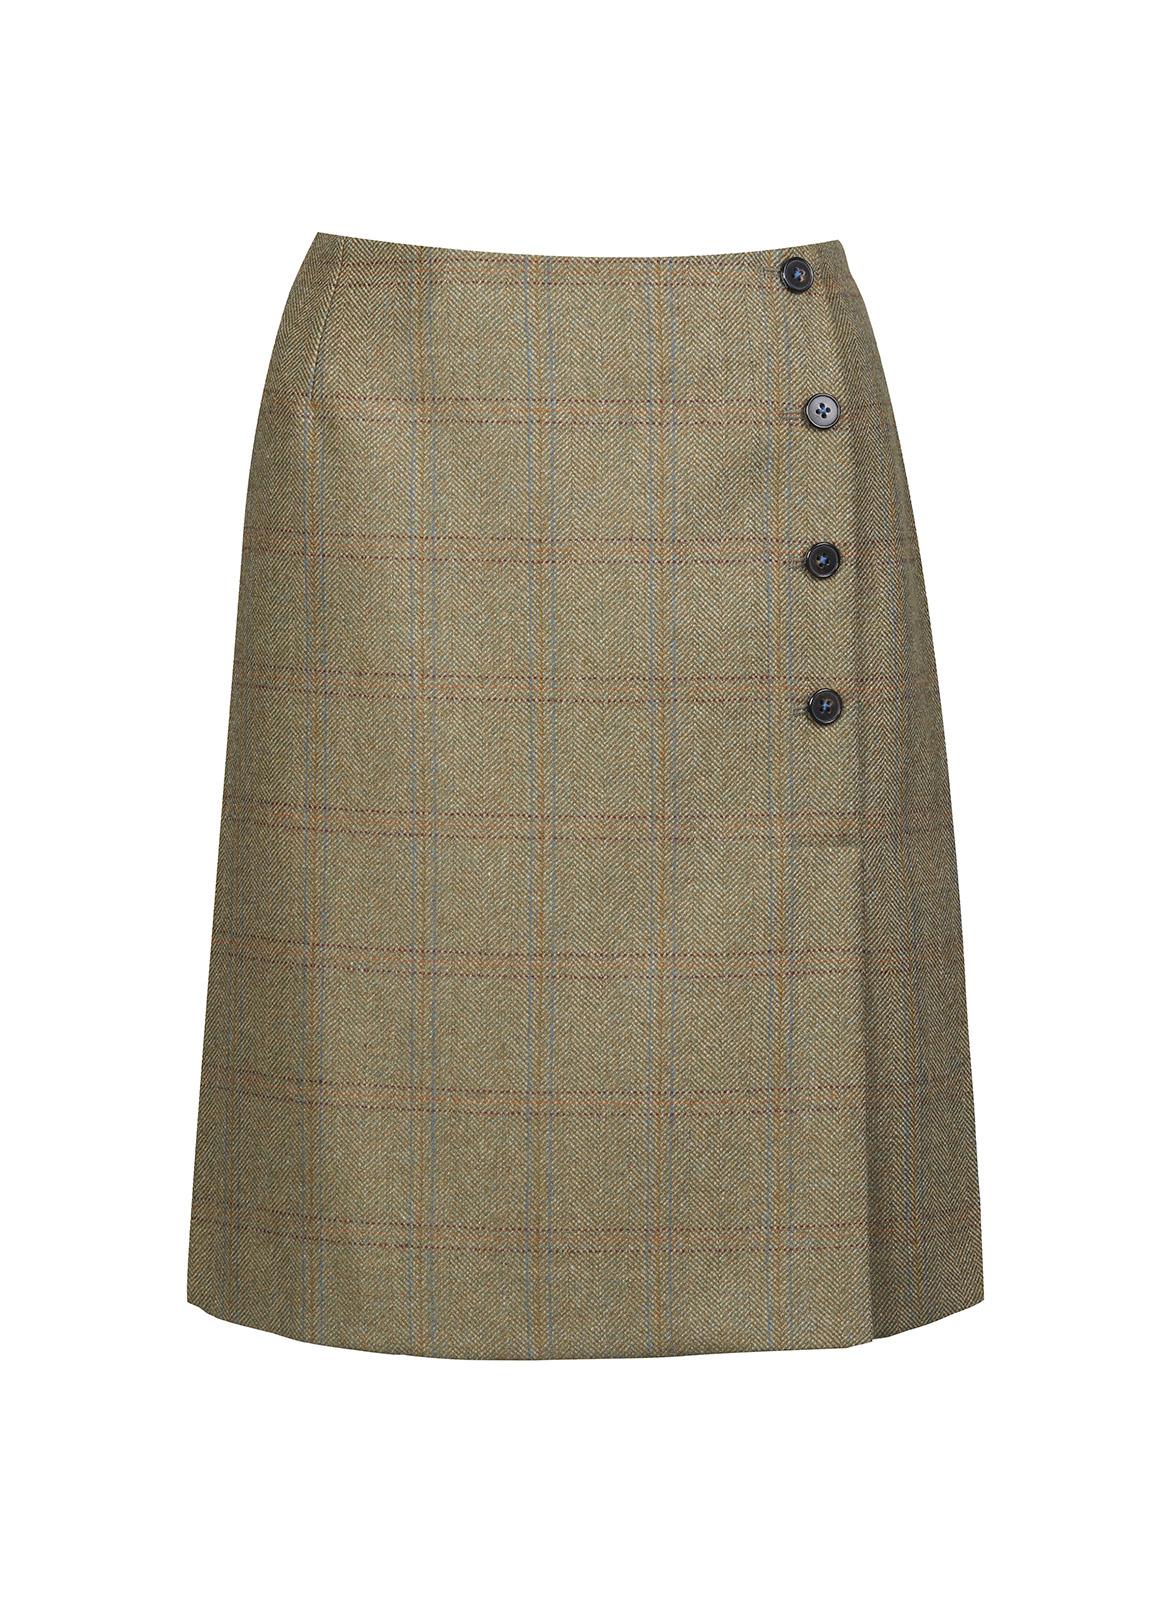 Dubarry_ Marjoram Slim Tweed Skirt - Acorn_Image_2